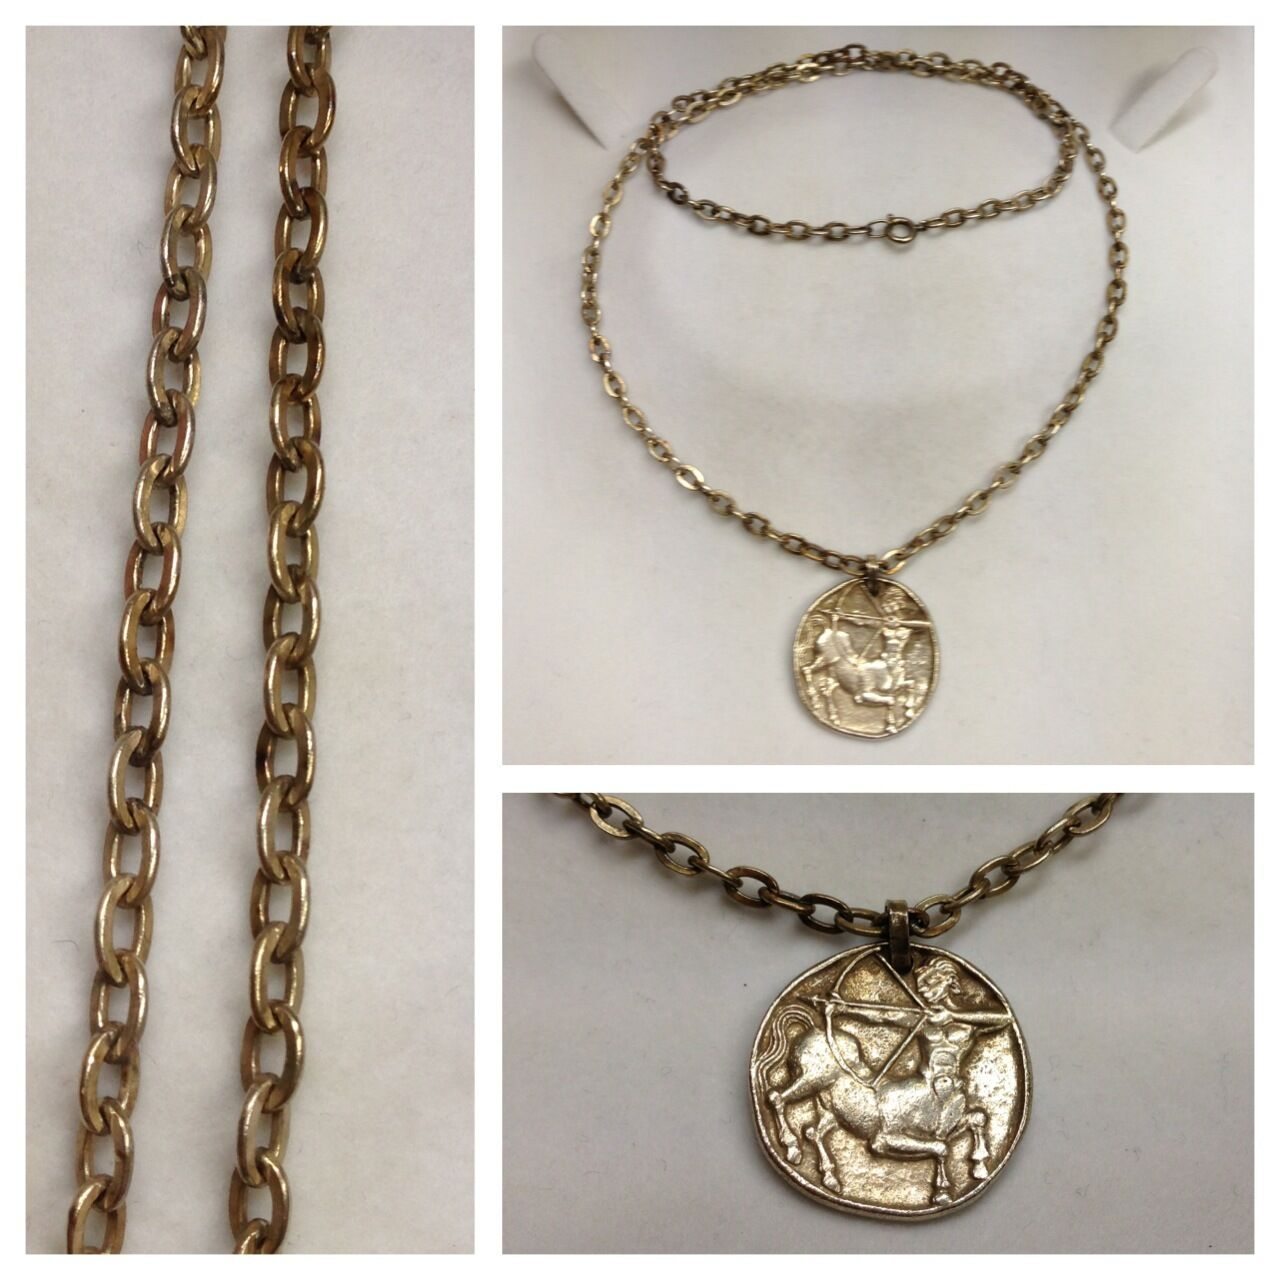 Style ancien collier 800 EN silver CHAÎNE pendentif CENTAUR